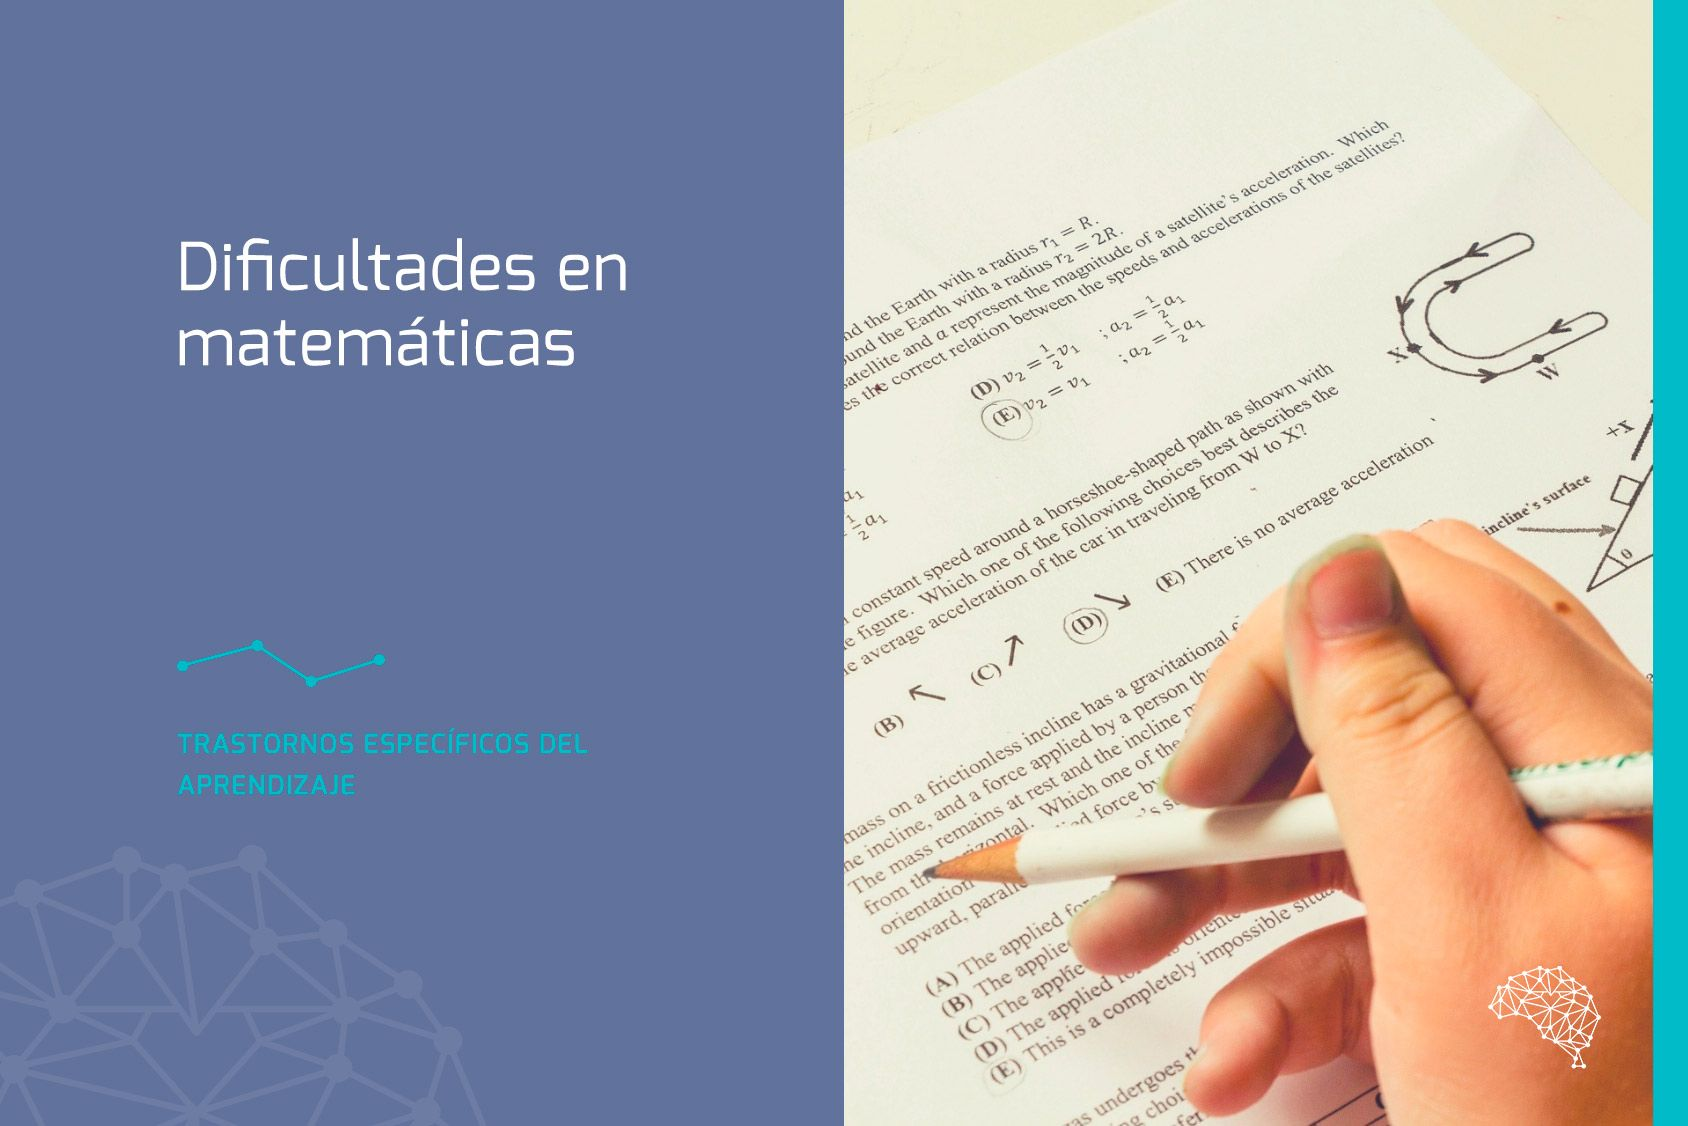 dificultades matematicas